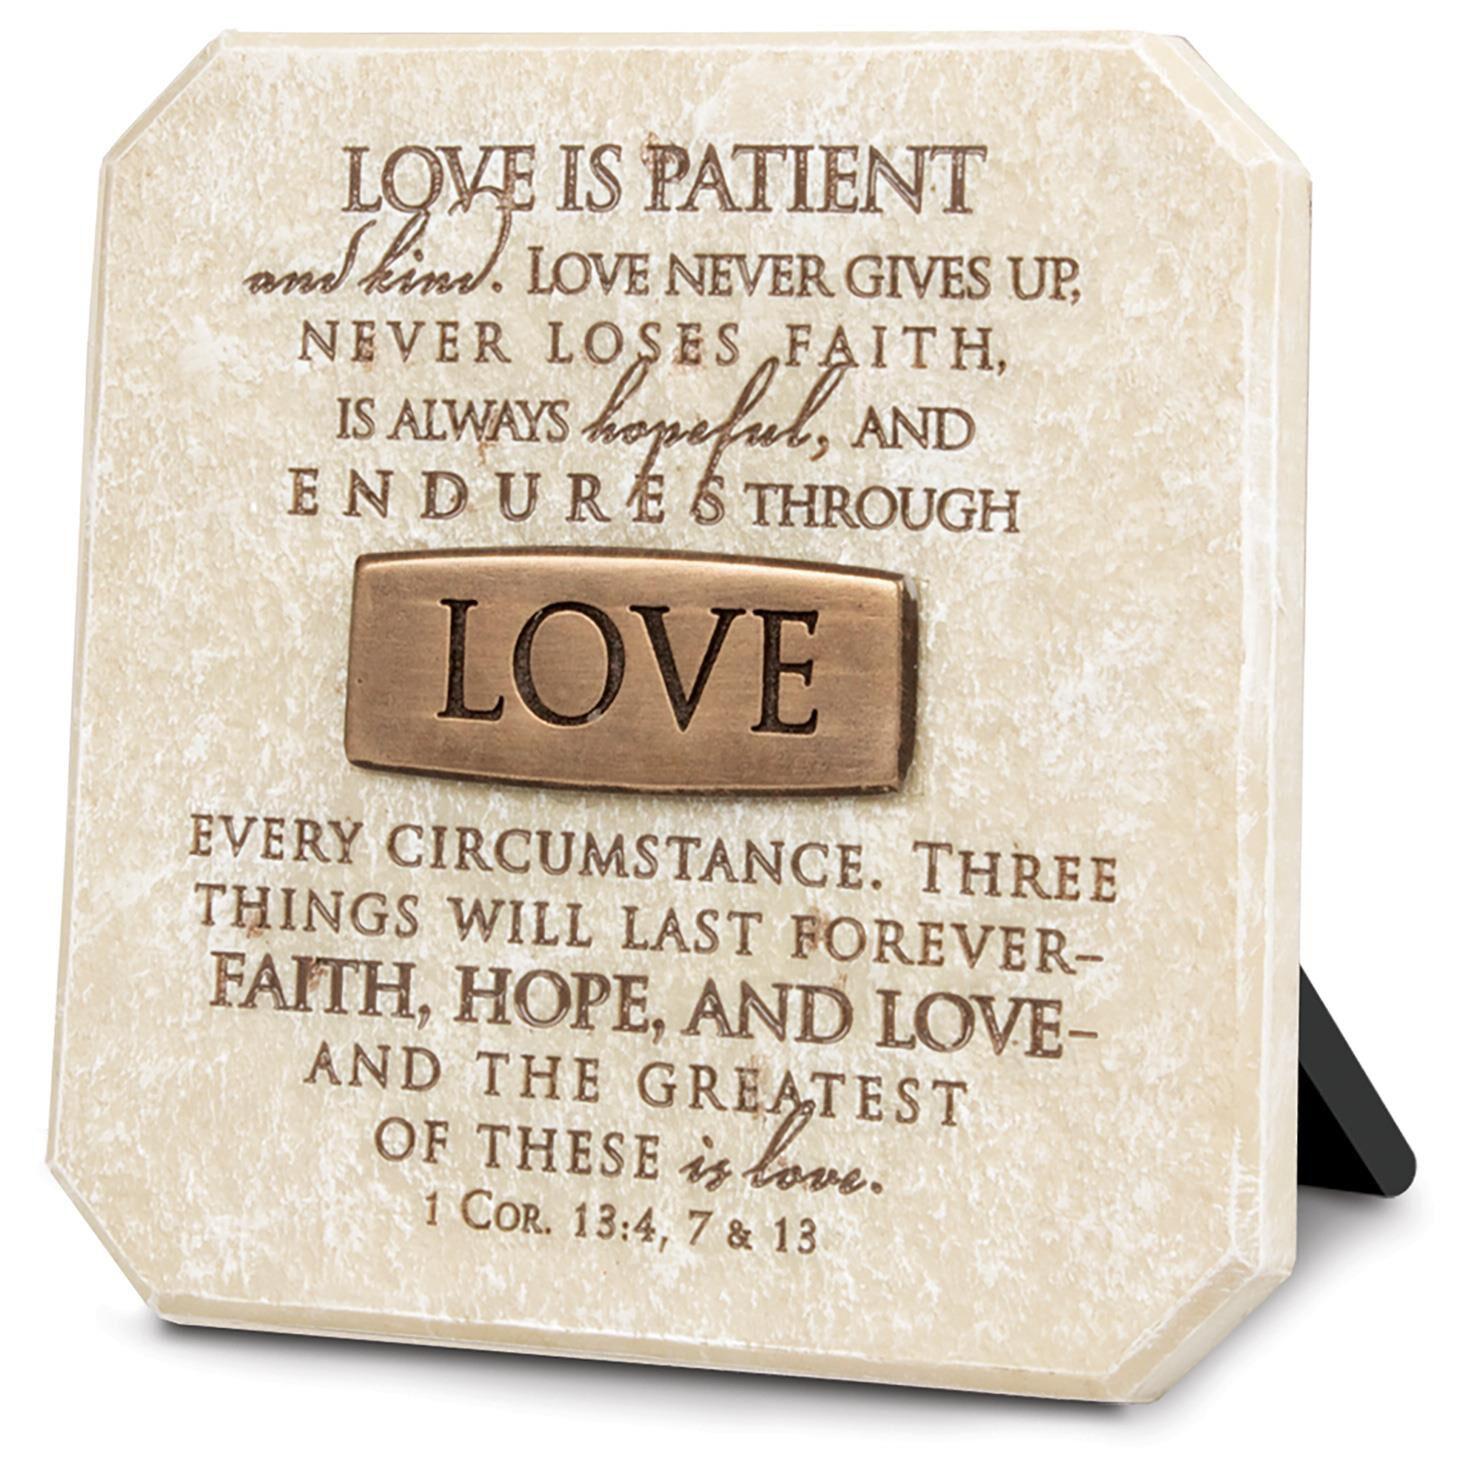 love stone plaque 1 corinthians 13 4 7 13 plaques hallmark. Black Bedroom Furniture Sets. Home Design Ideas